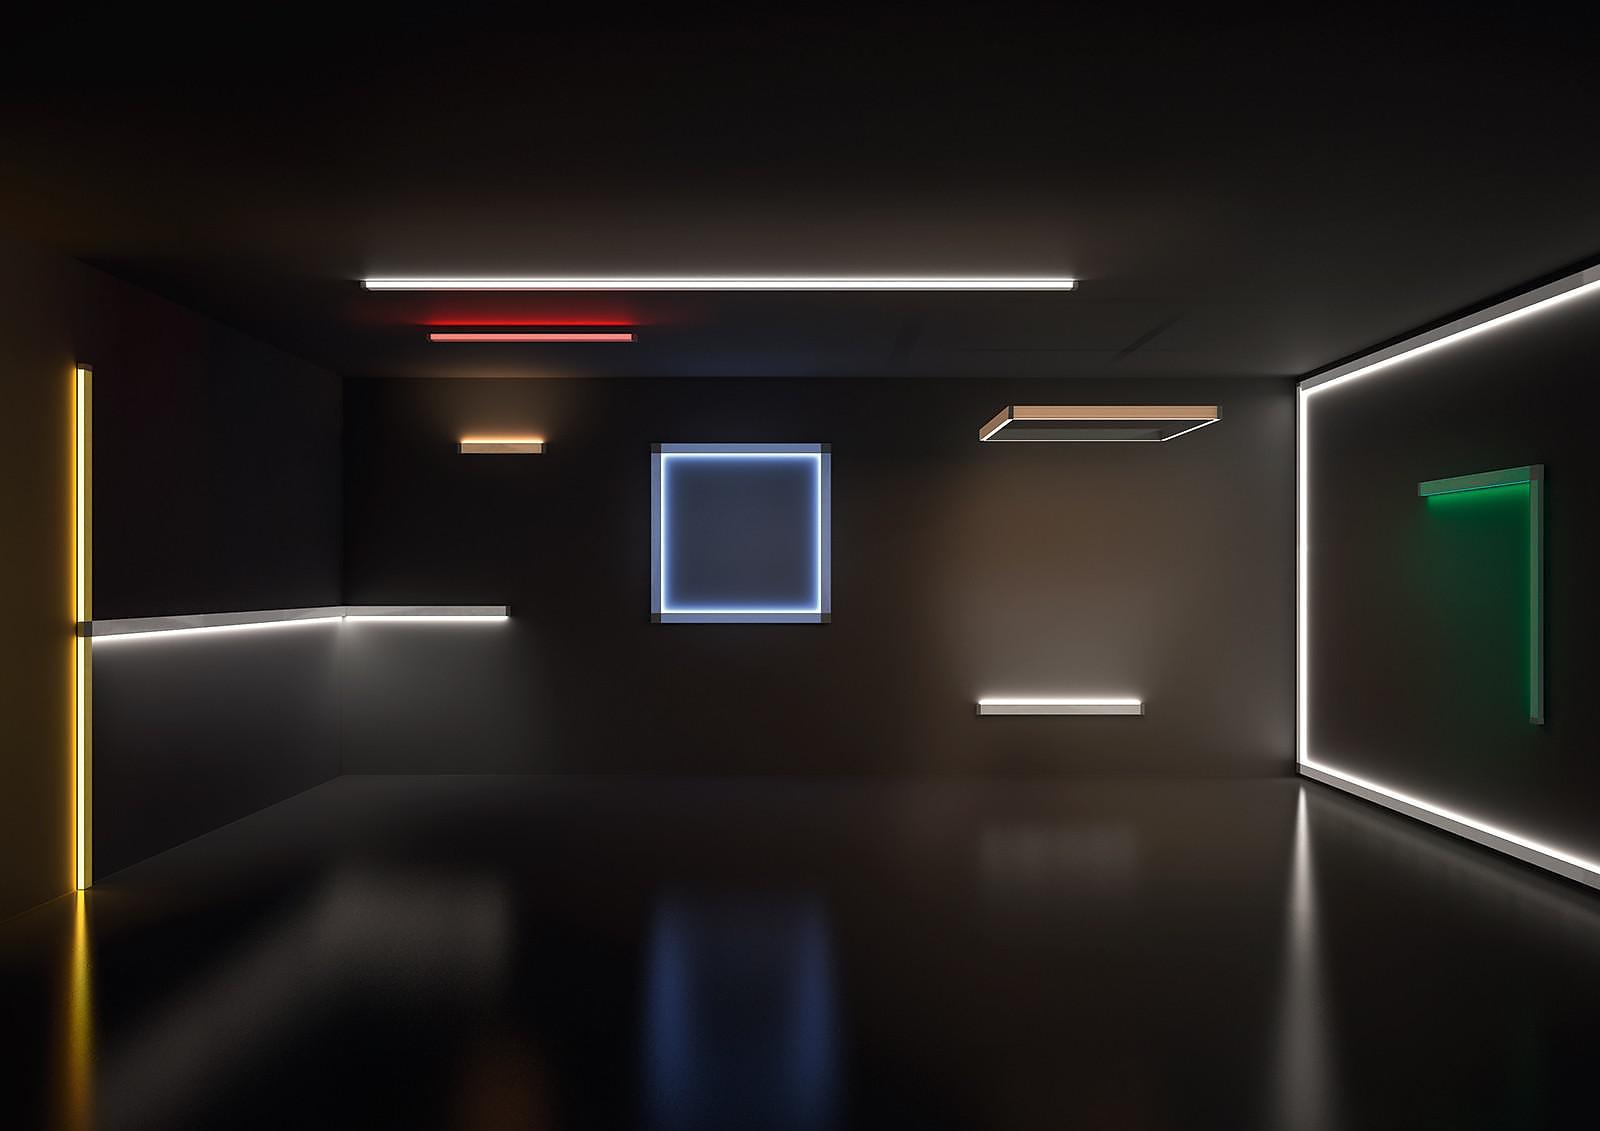 Scrittura Linear LED Modular Lights by Artemide.